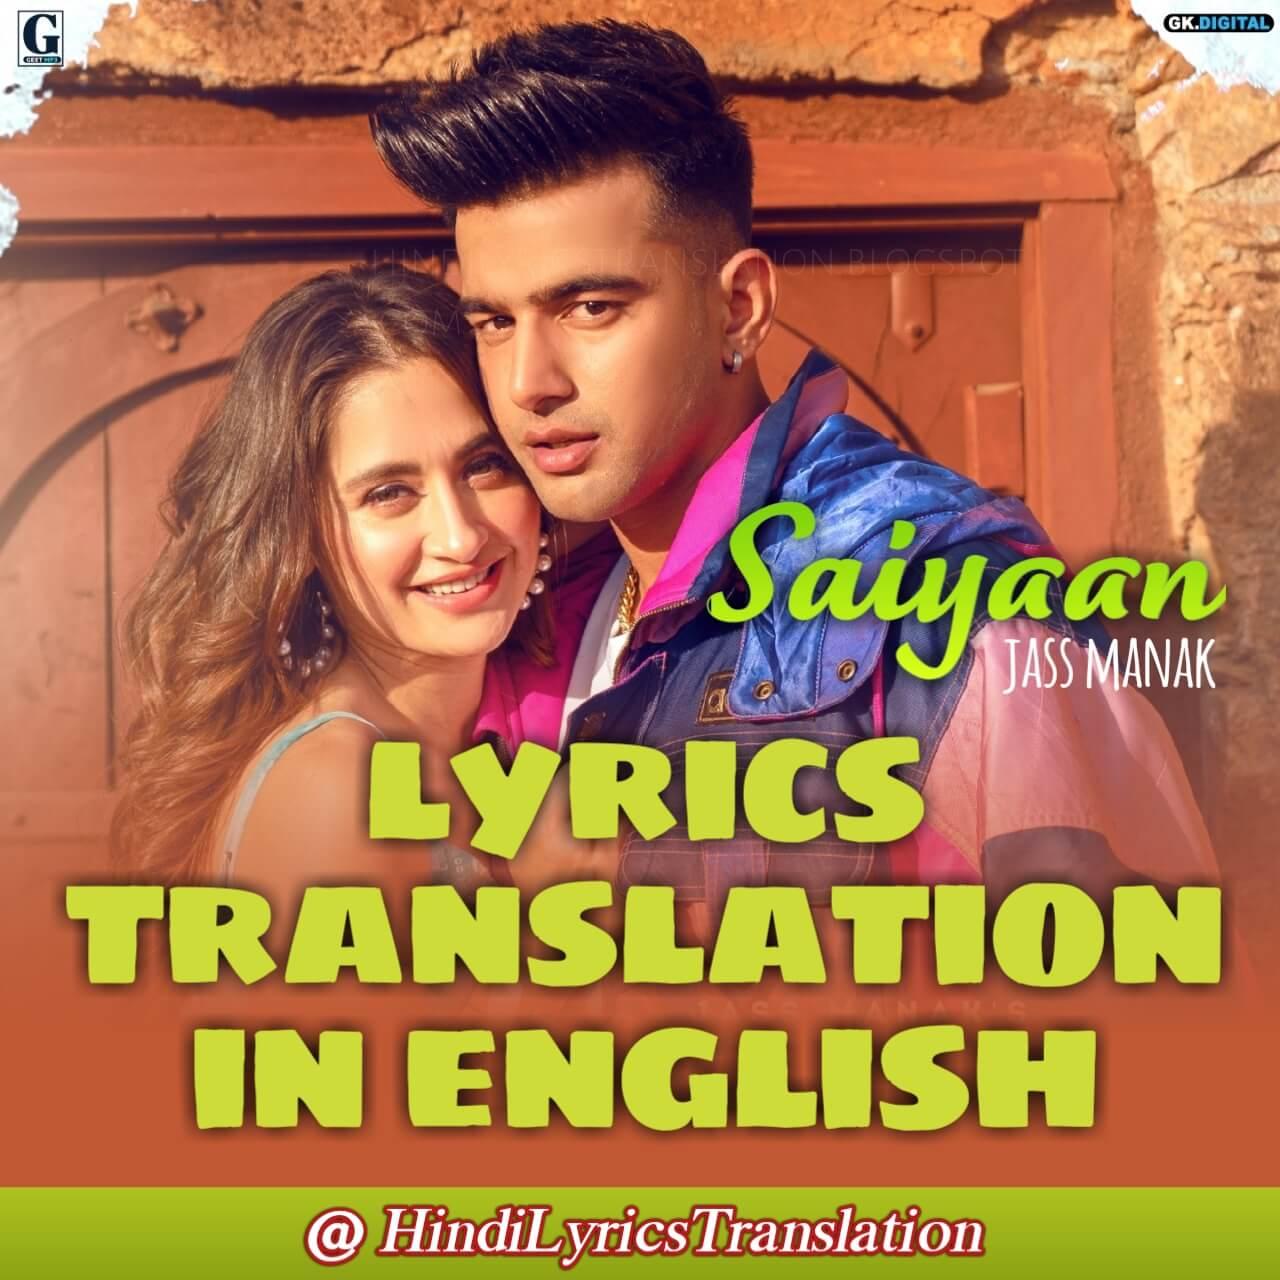 Saiyaan Lyrics Translation In English